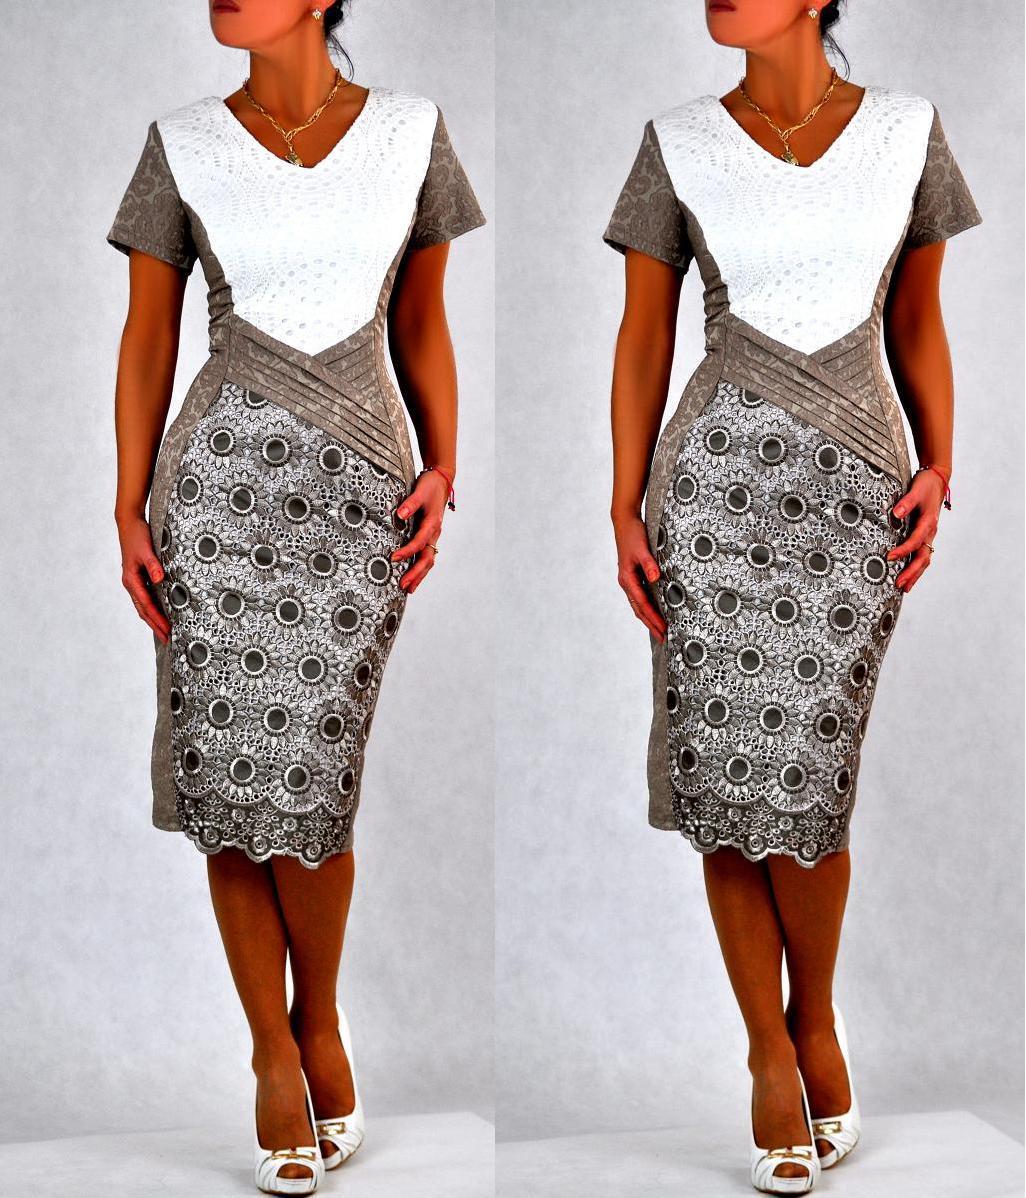 Púzdrové šaty - Obrázok č. 52